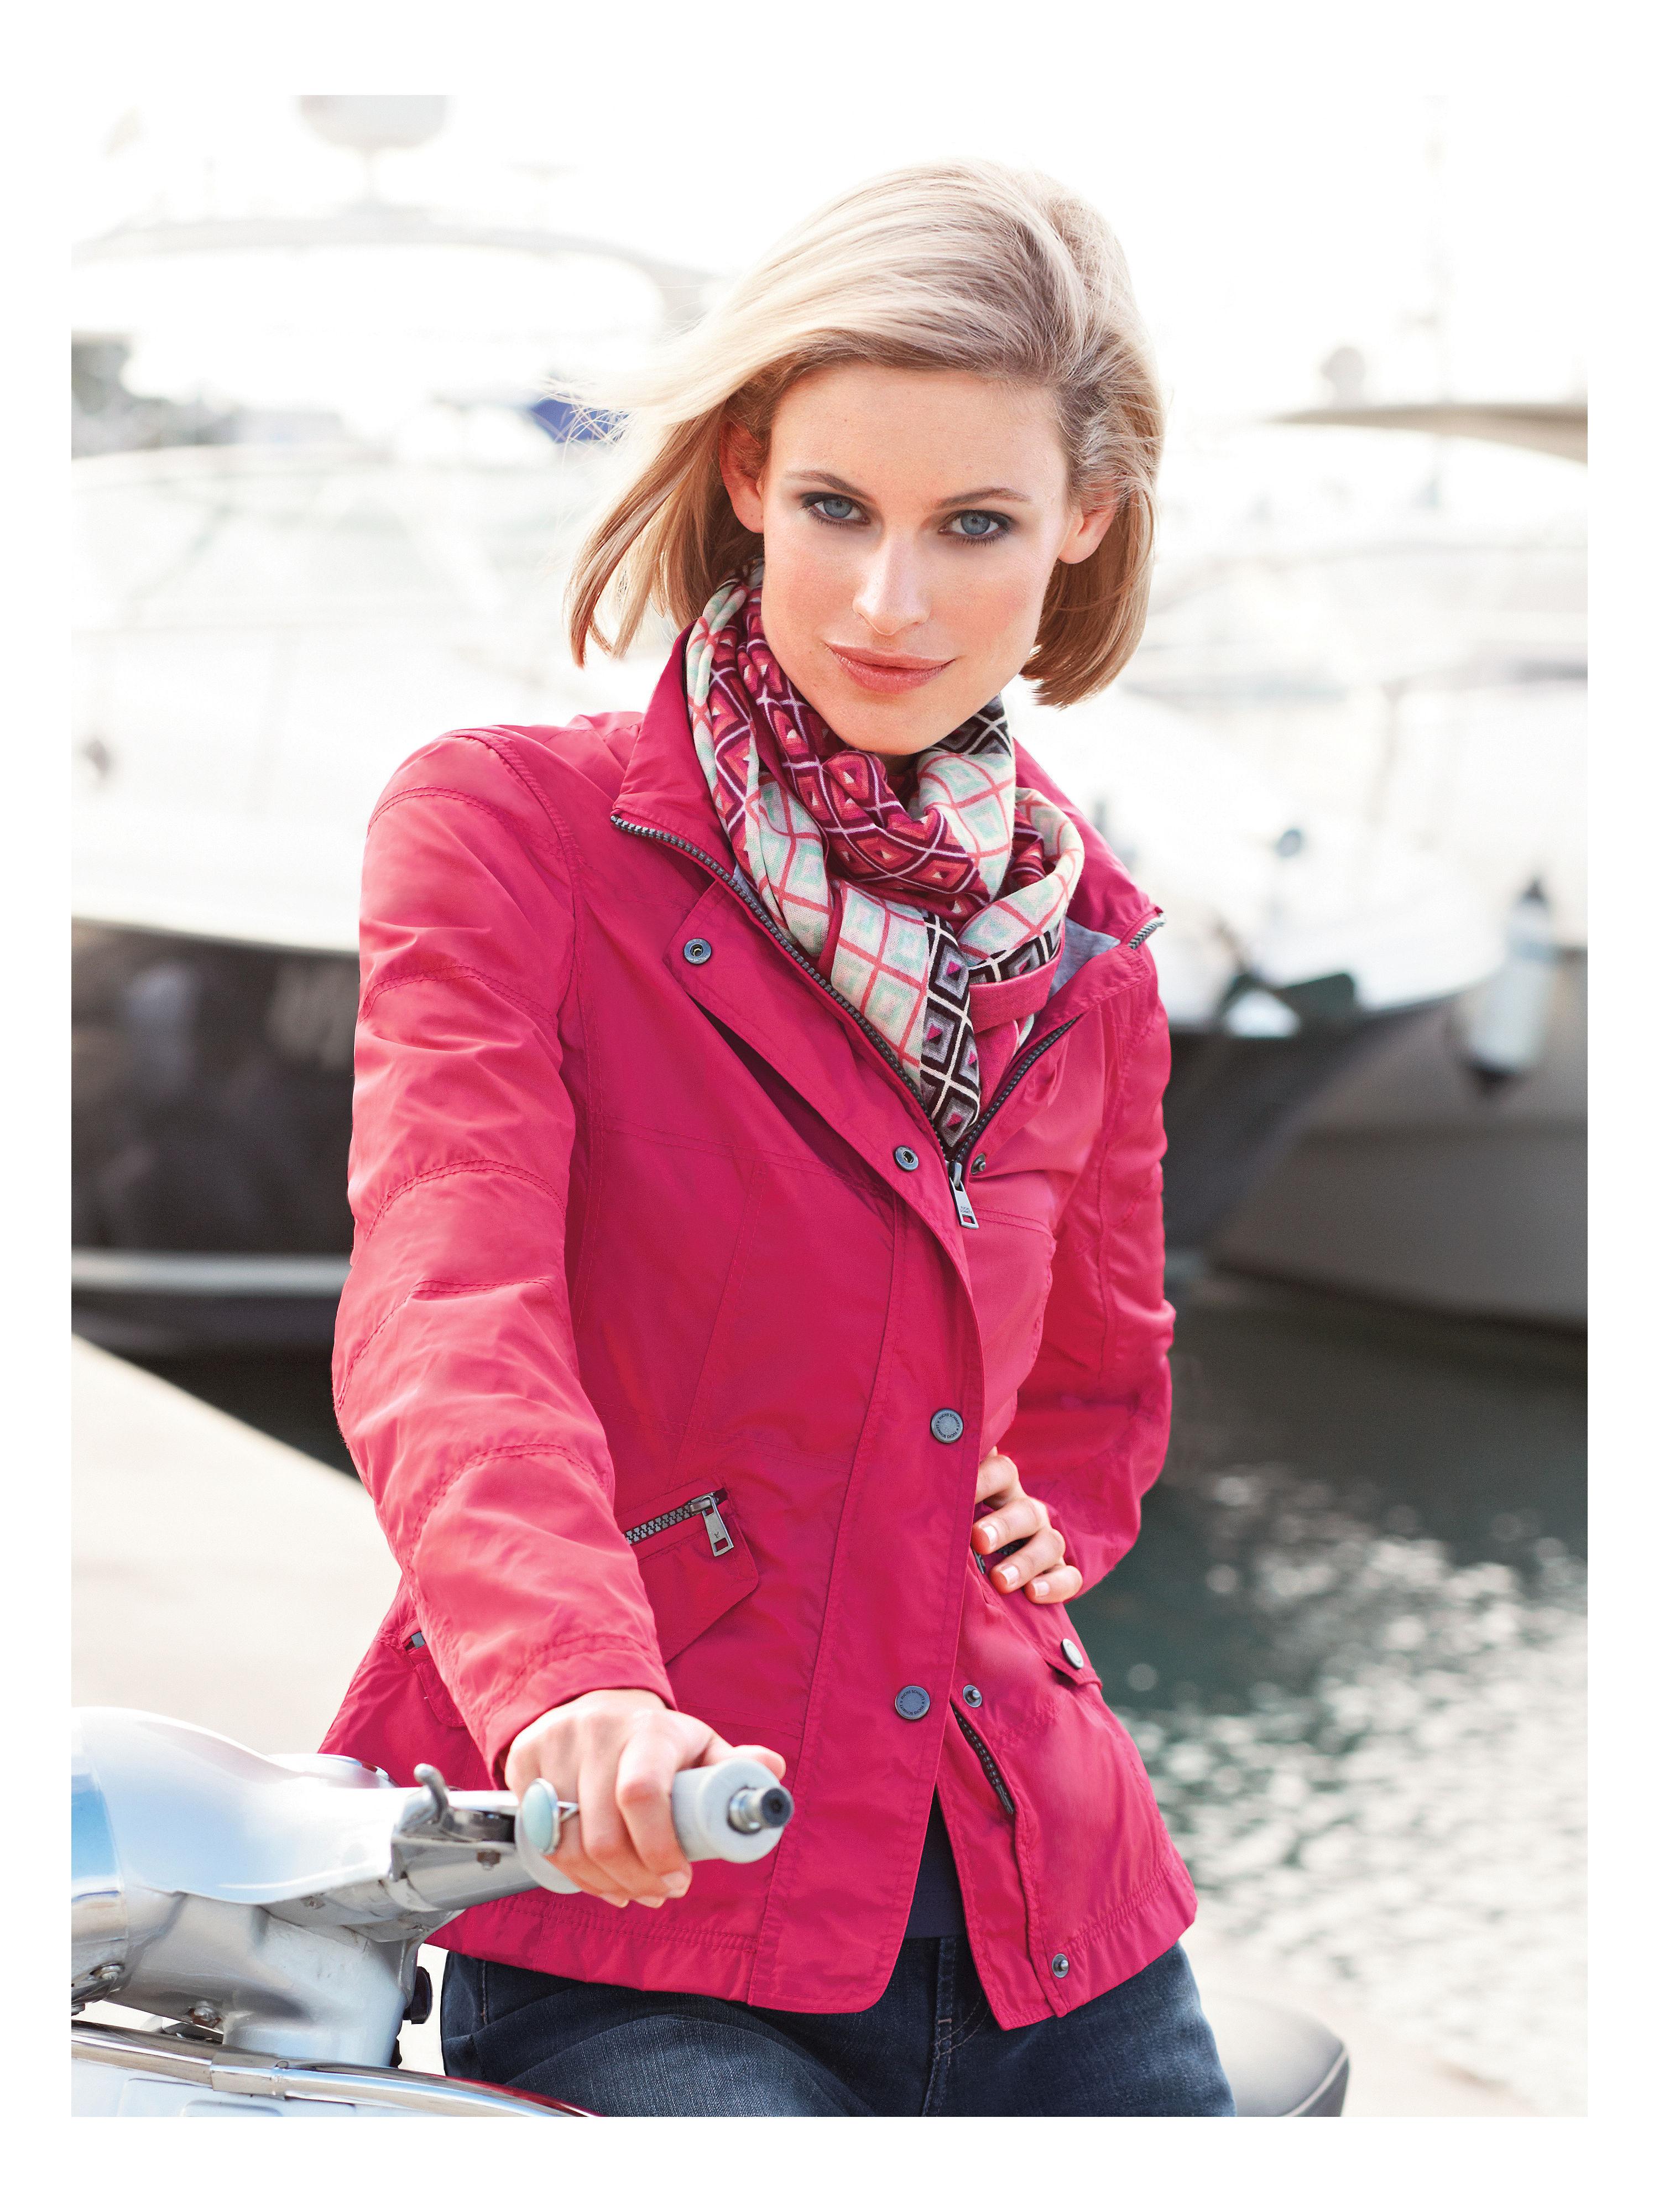 jacket fuchs schmitt bright pink size 22. Black Bedroom Furniture Sets. Home Design Ideas